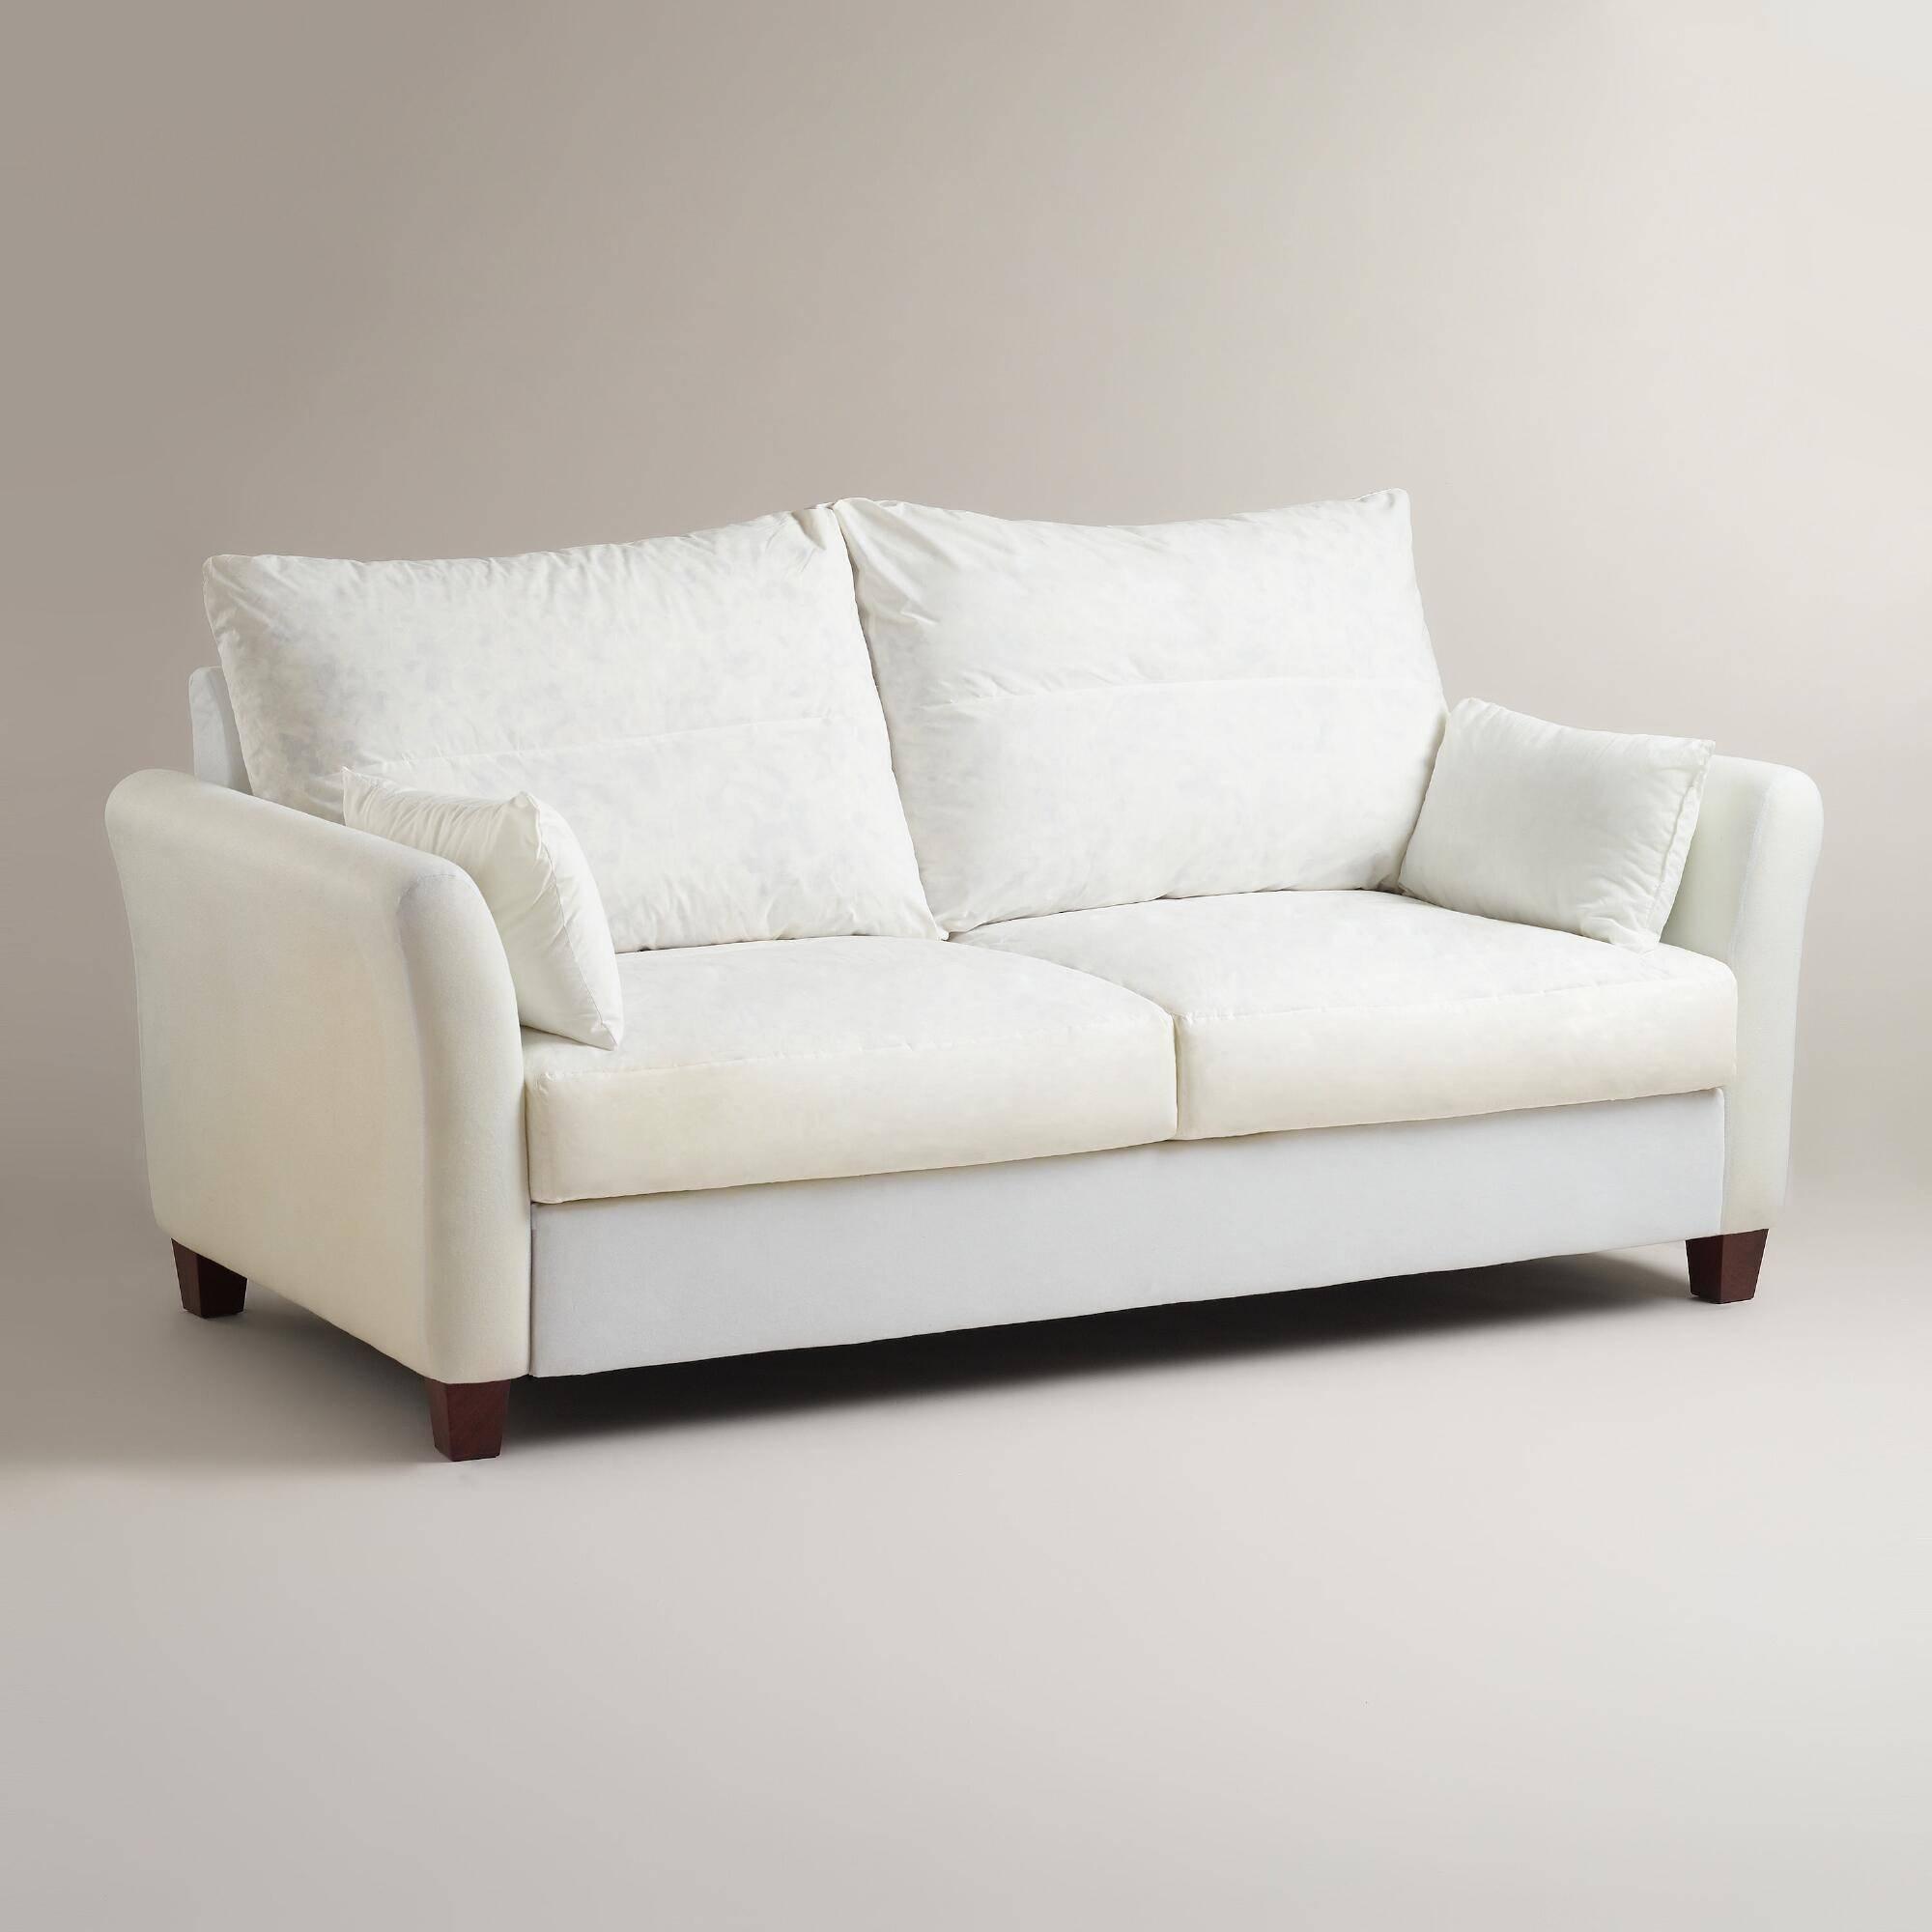 Sofa Ideas: Luxe Sofas (Explore #3 Of 20 Photos) with regard to Luxe Sofas (Image 15 of 15)